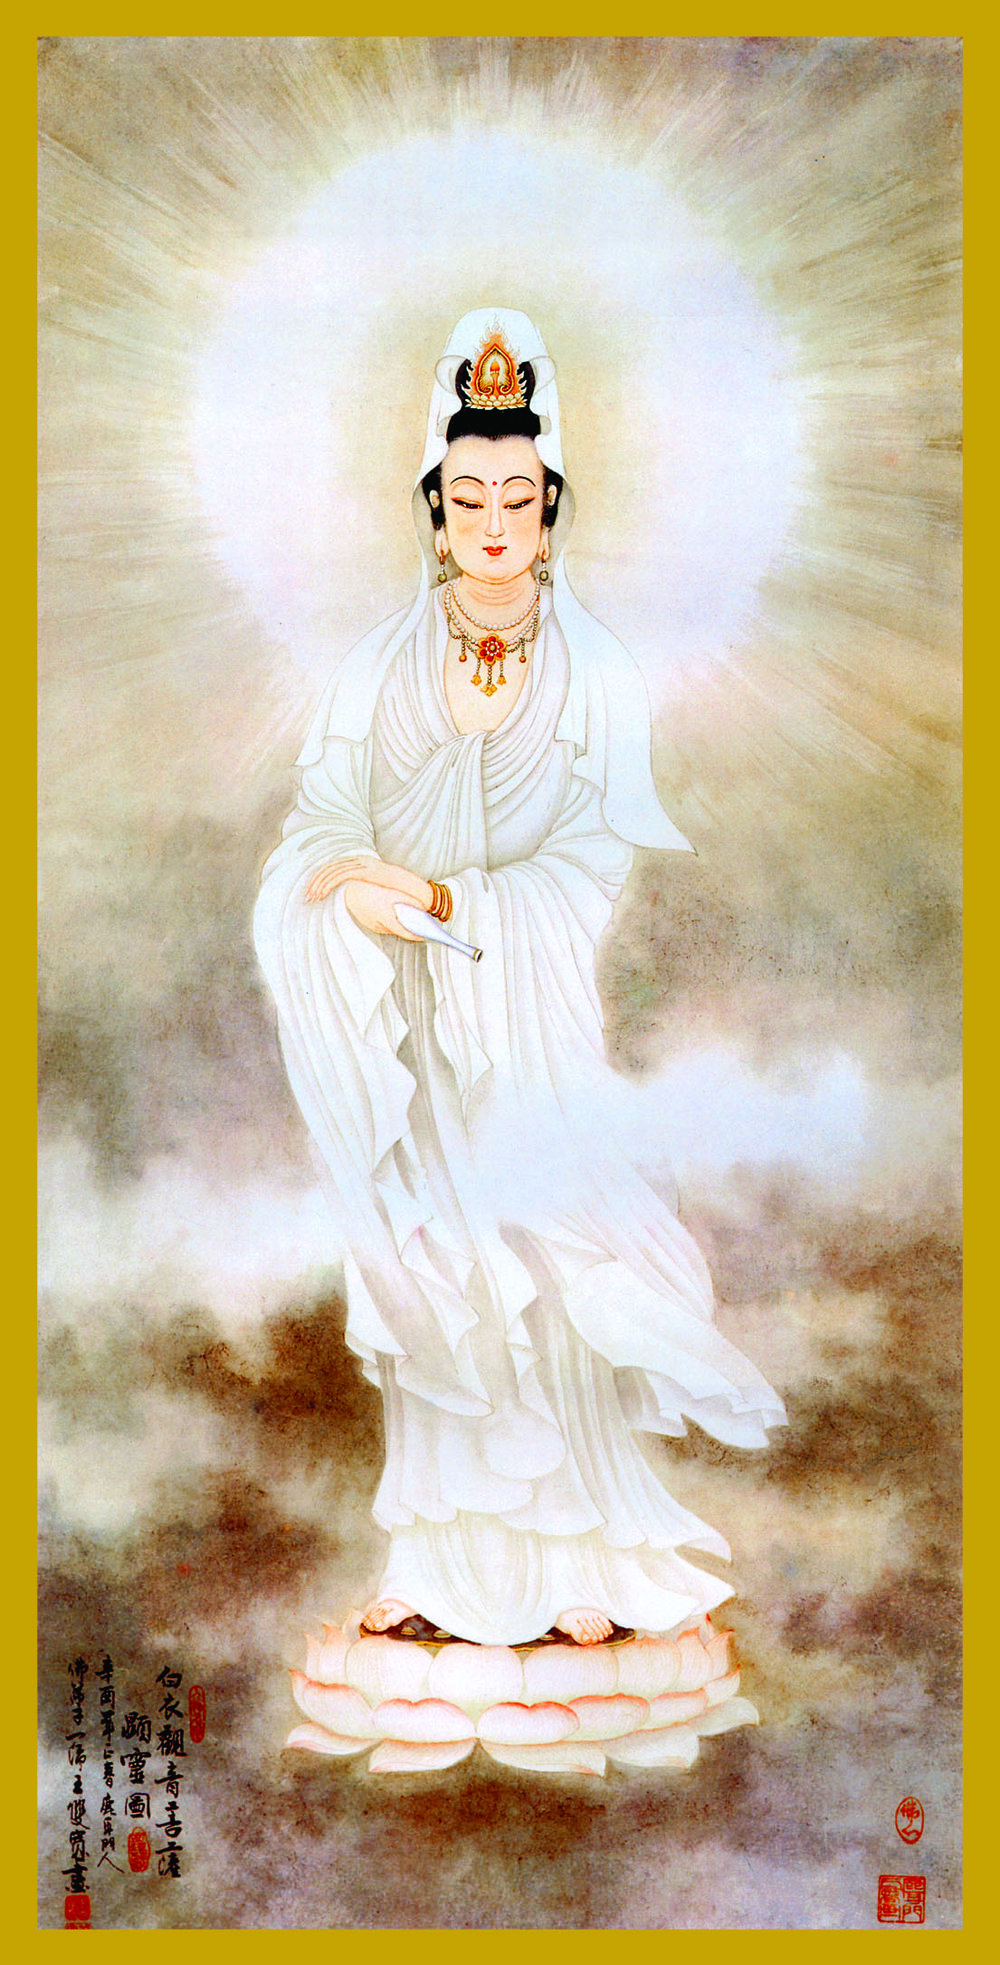 KY-LOKuan YinBodhisattva of Compassion - Kuan Shih Yin is the Bodhisattva of Compassion. Her Name means